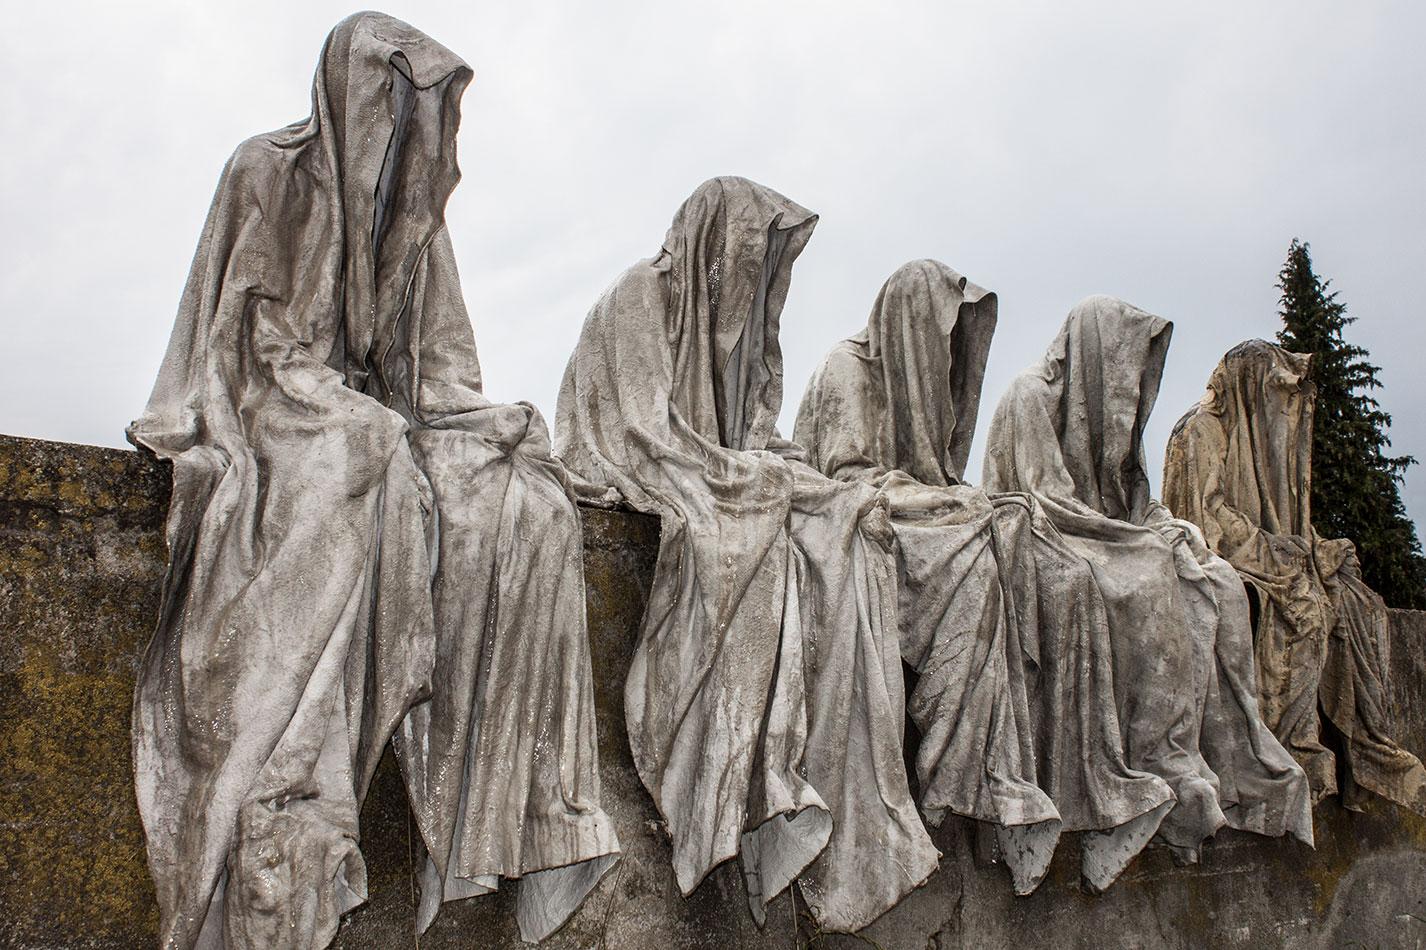 mobile-gallery-guardians-of-time-sculptor-manfred-kili-kielnhofer-contemporary-fine-art-design-sculpture-modern-famous-3d-statue-public-arts-2600